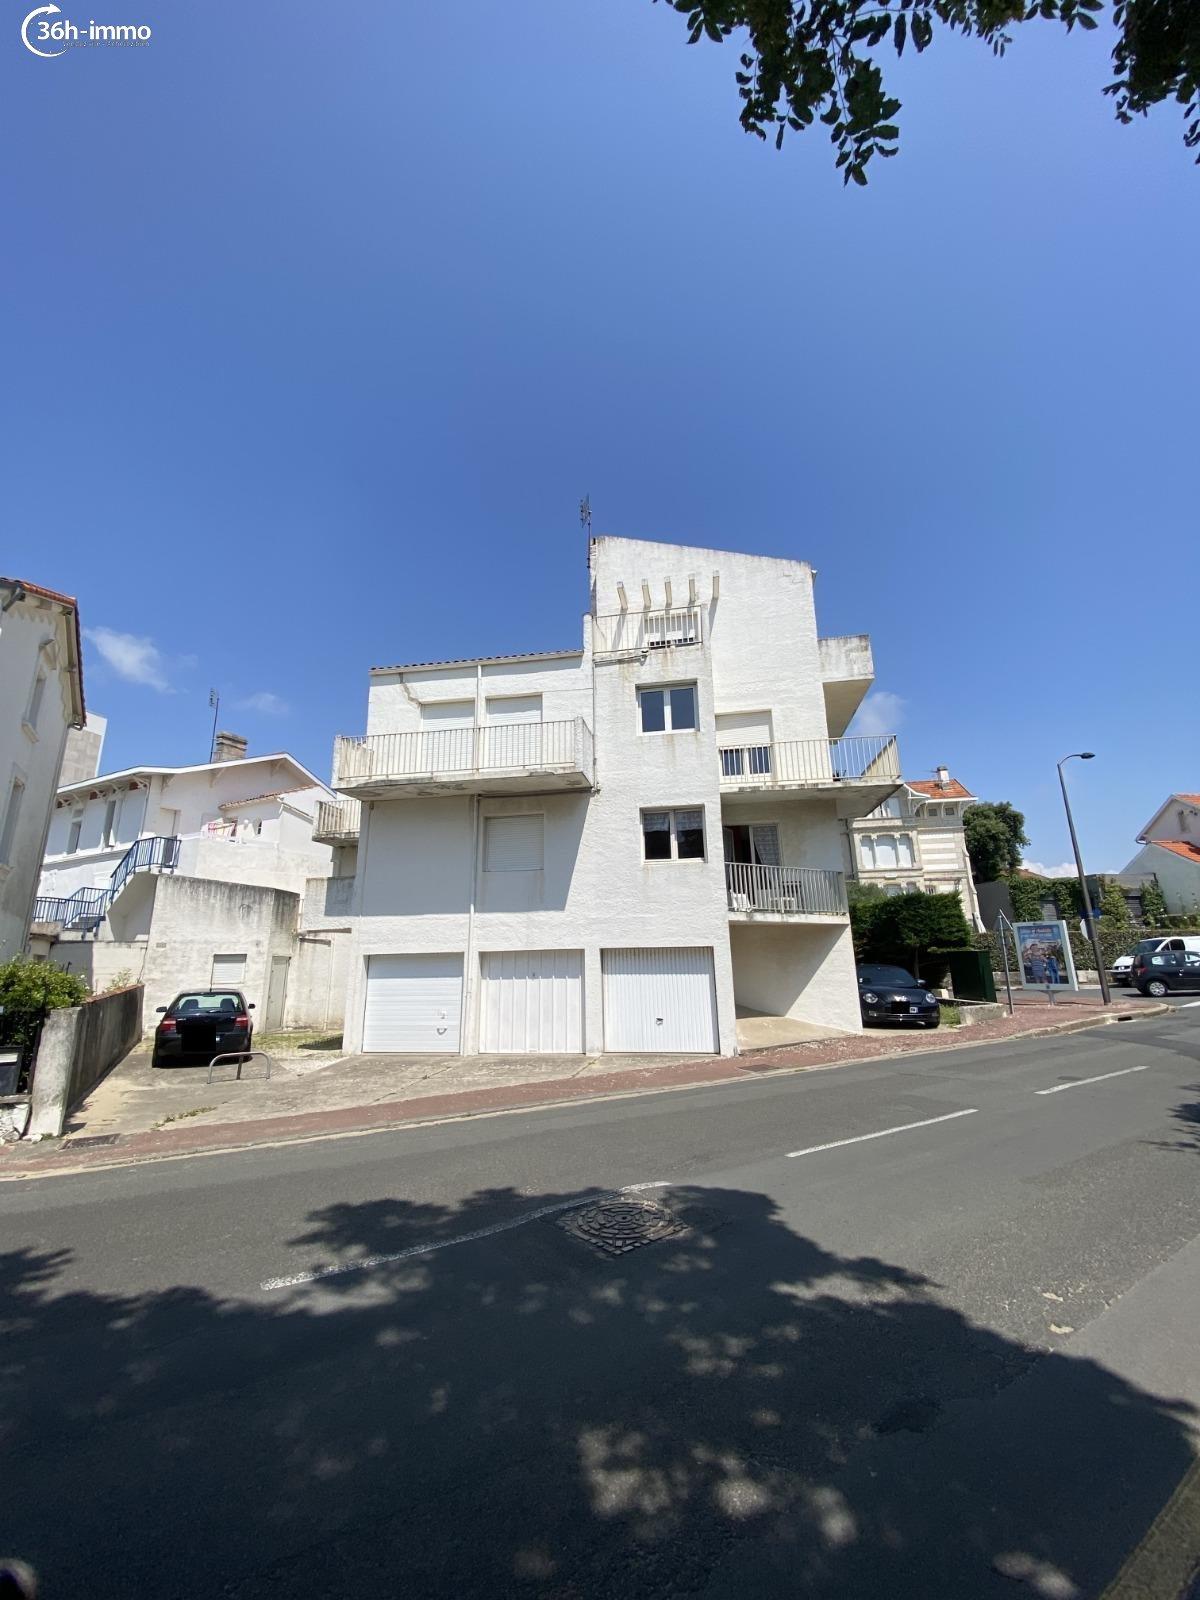 Appartement Royan 17200 Charente-Maritime 23 m<sup>2</sup> 1 pi&eagrave;ce 105000 euros